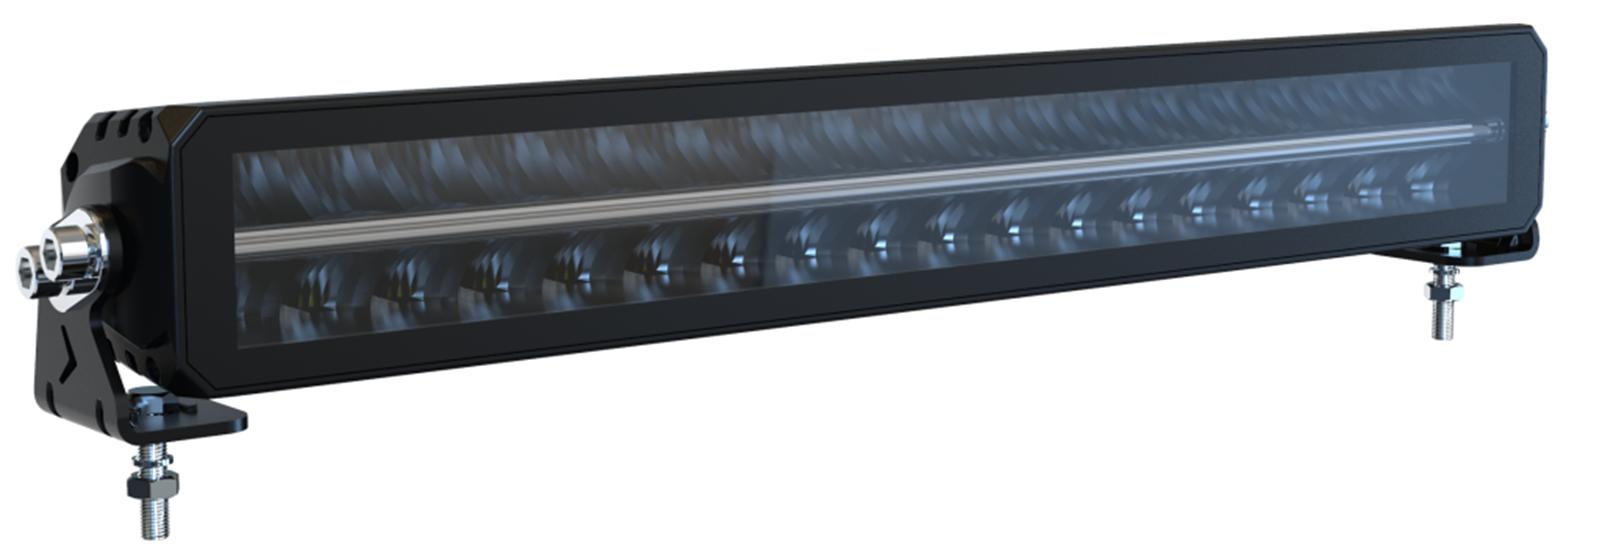 "SHARK LED Light Bar EU homologated OSRAM 12"", 60W"